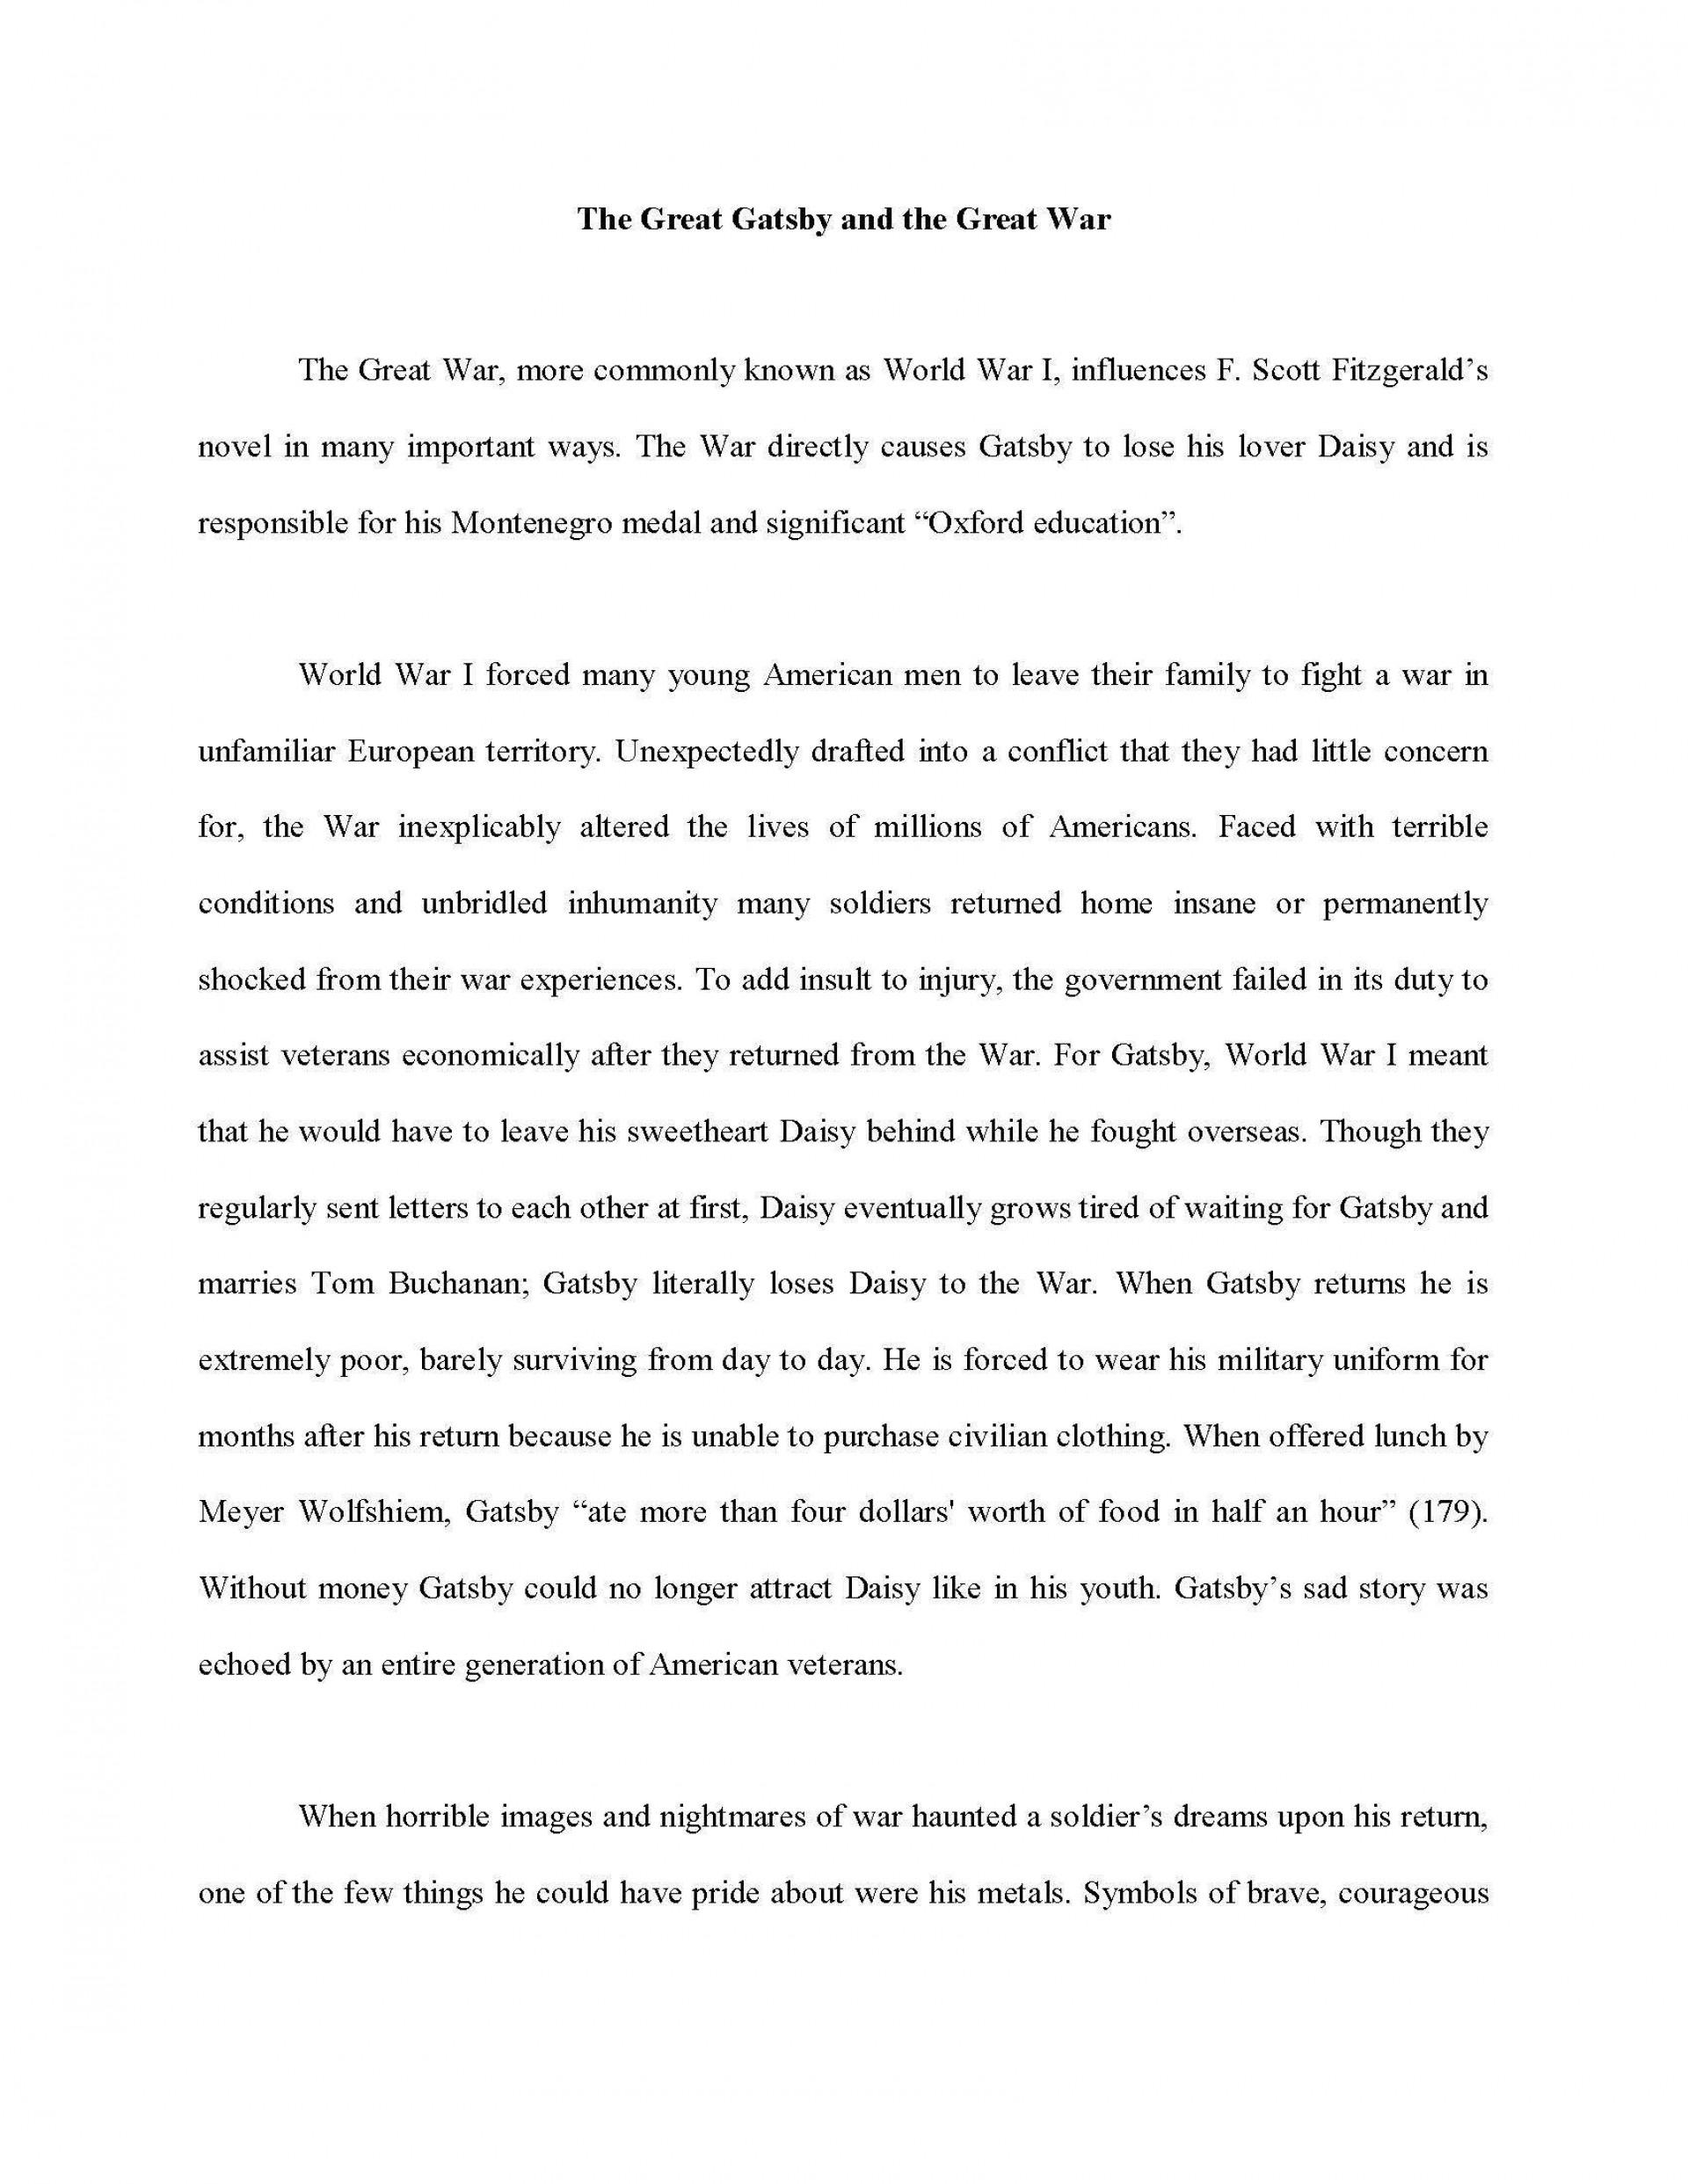 006 Essay Example Smartphone Informative Awesome In Urdu Marathi 1920